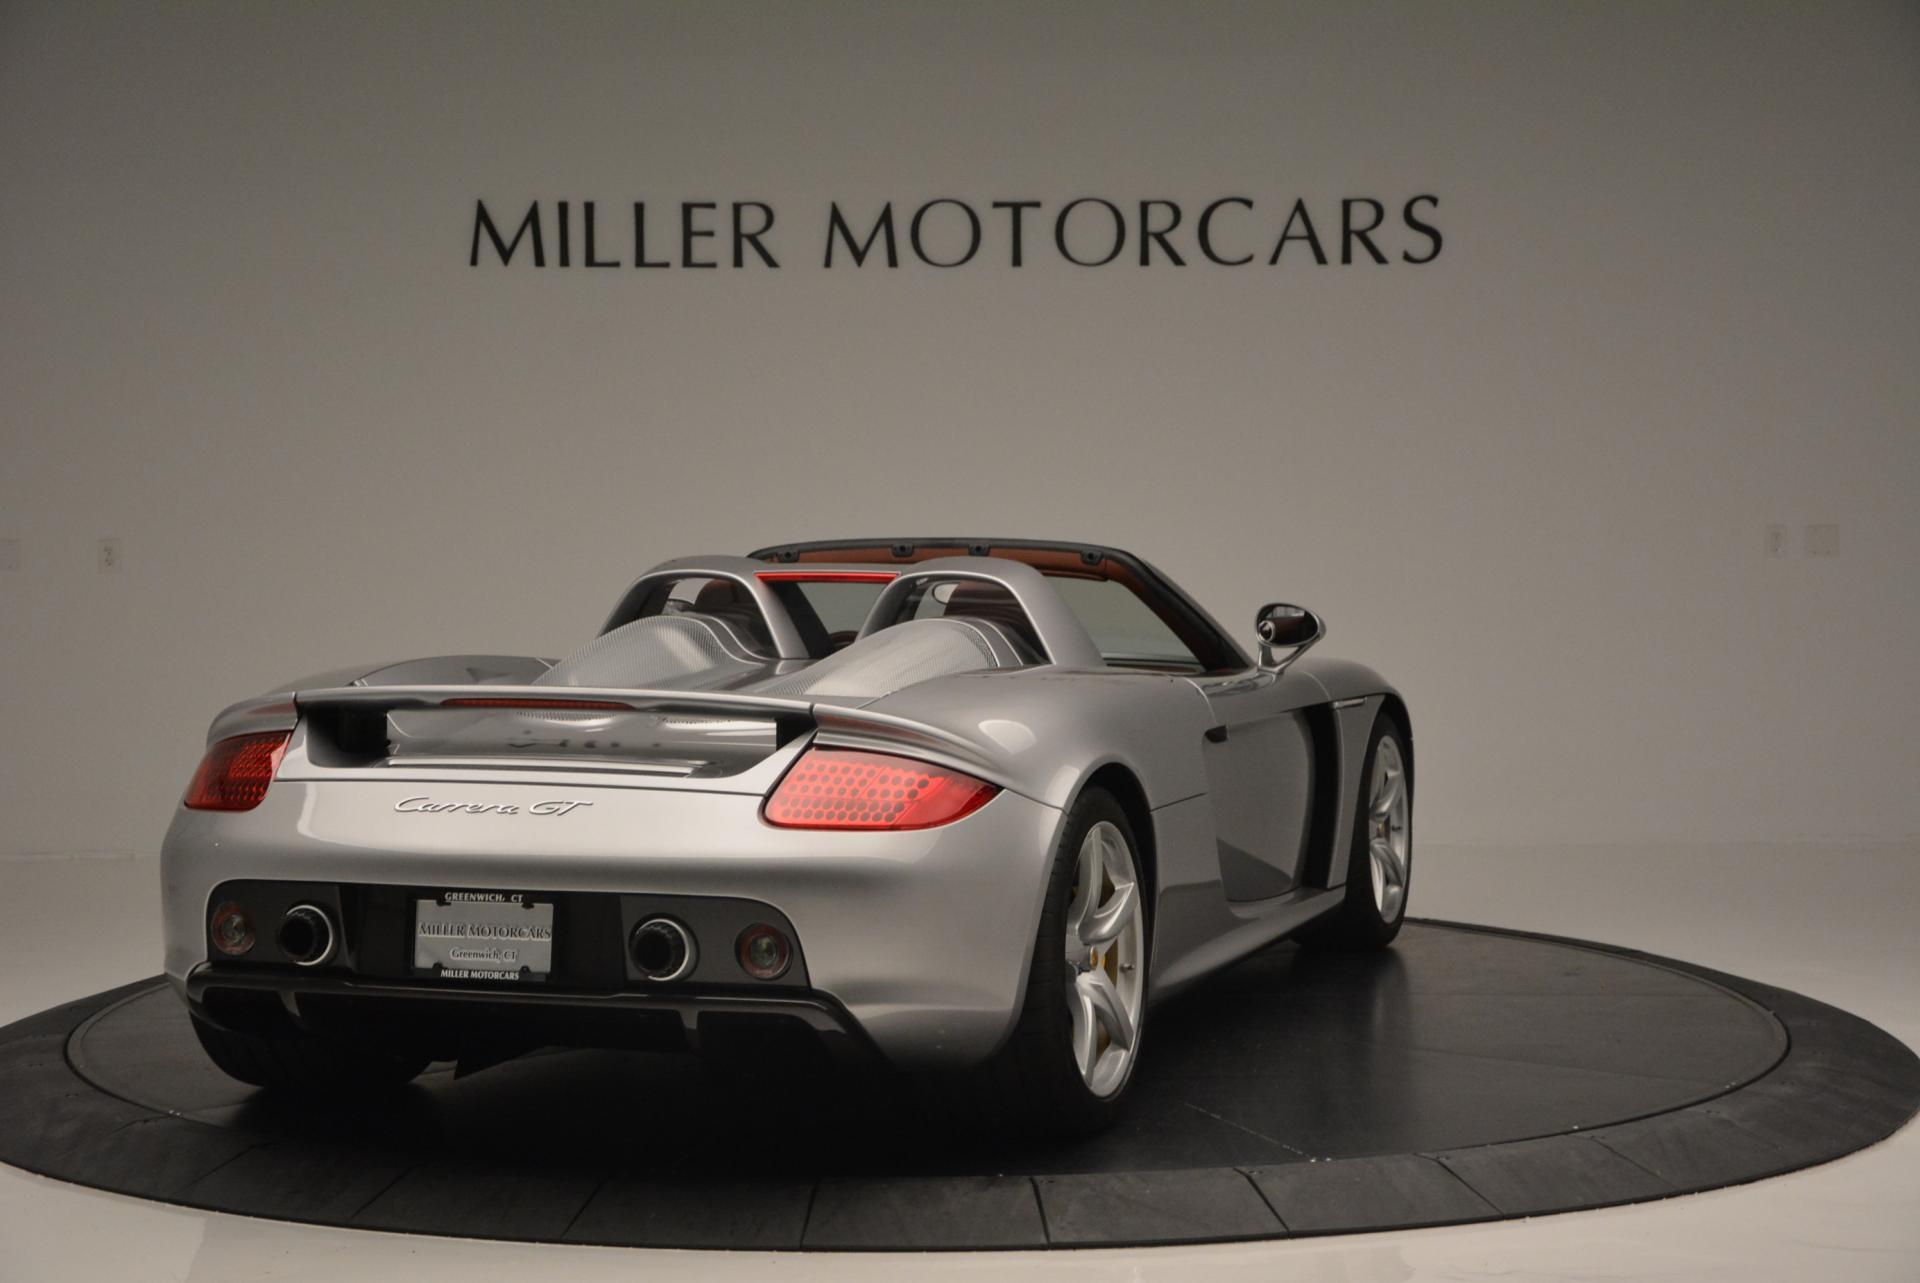 Used 2005 Porsche Carrera GT  For Sale In Greenwich, CT 108_p9